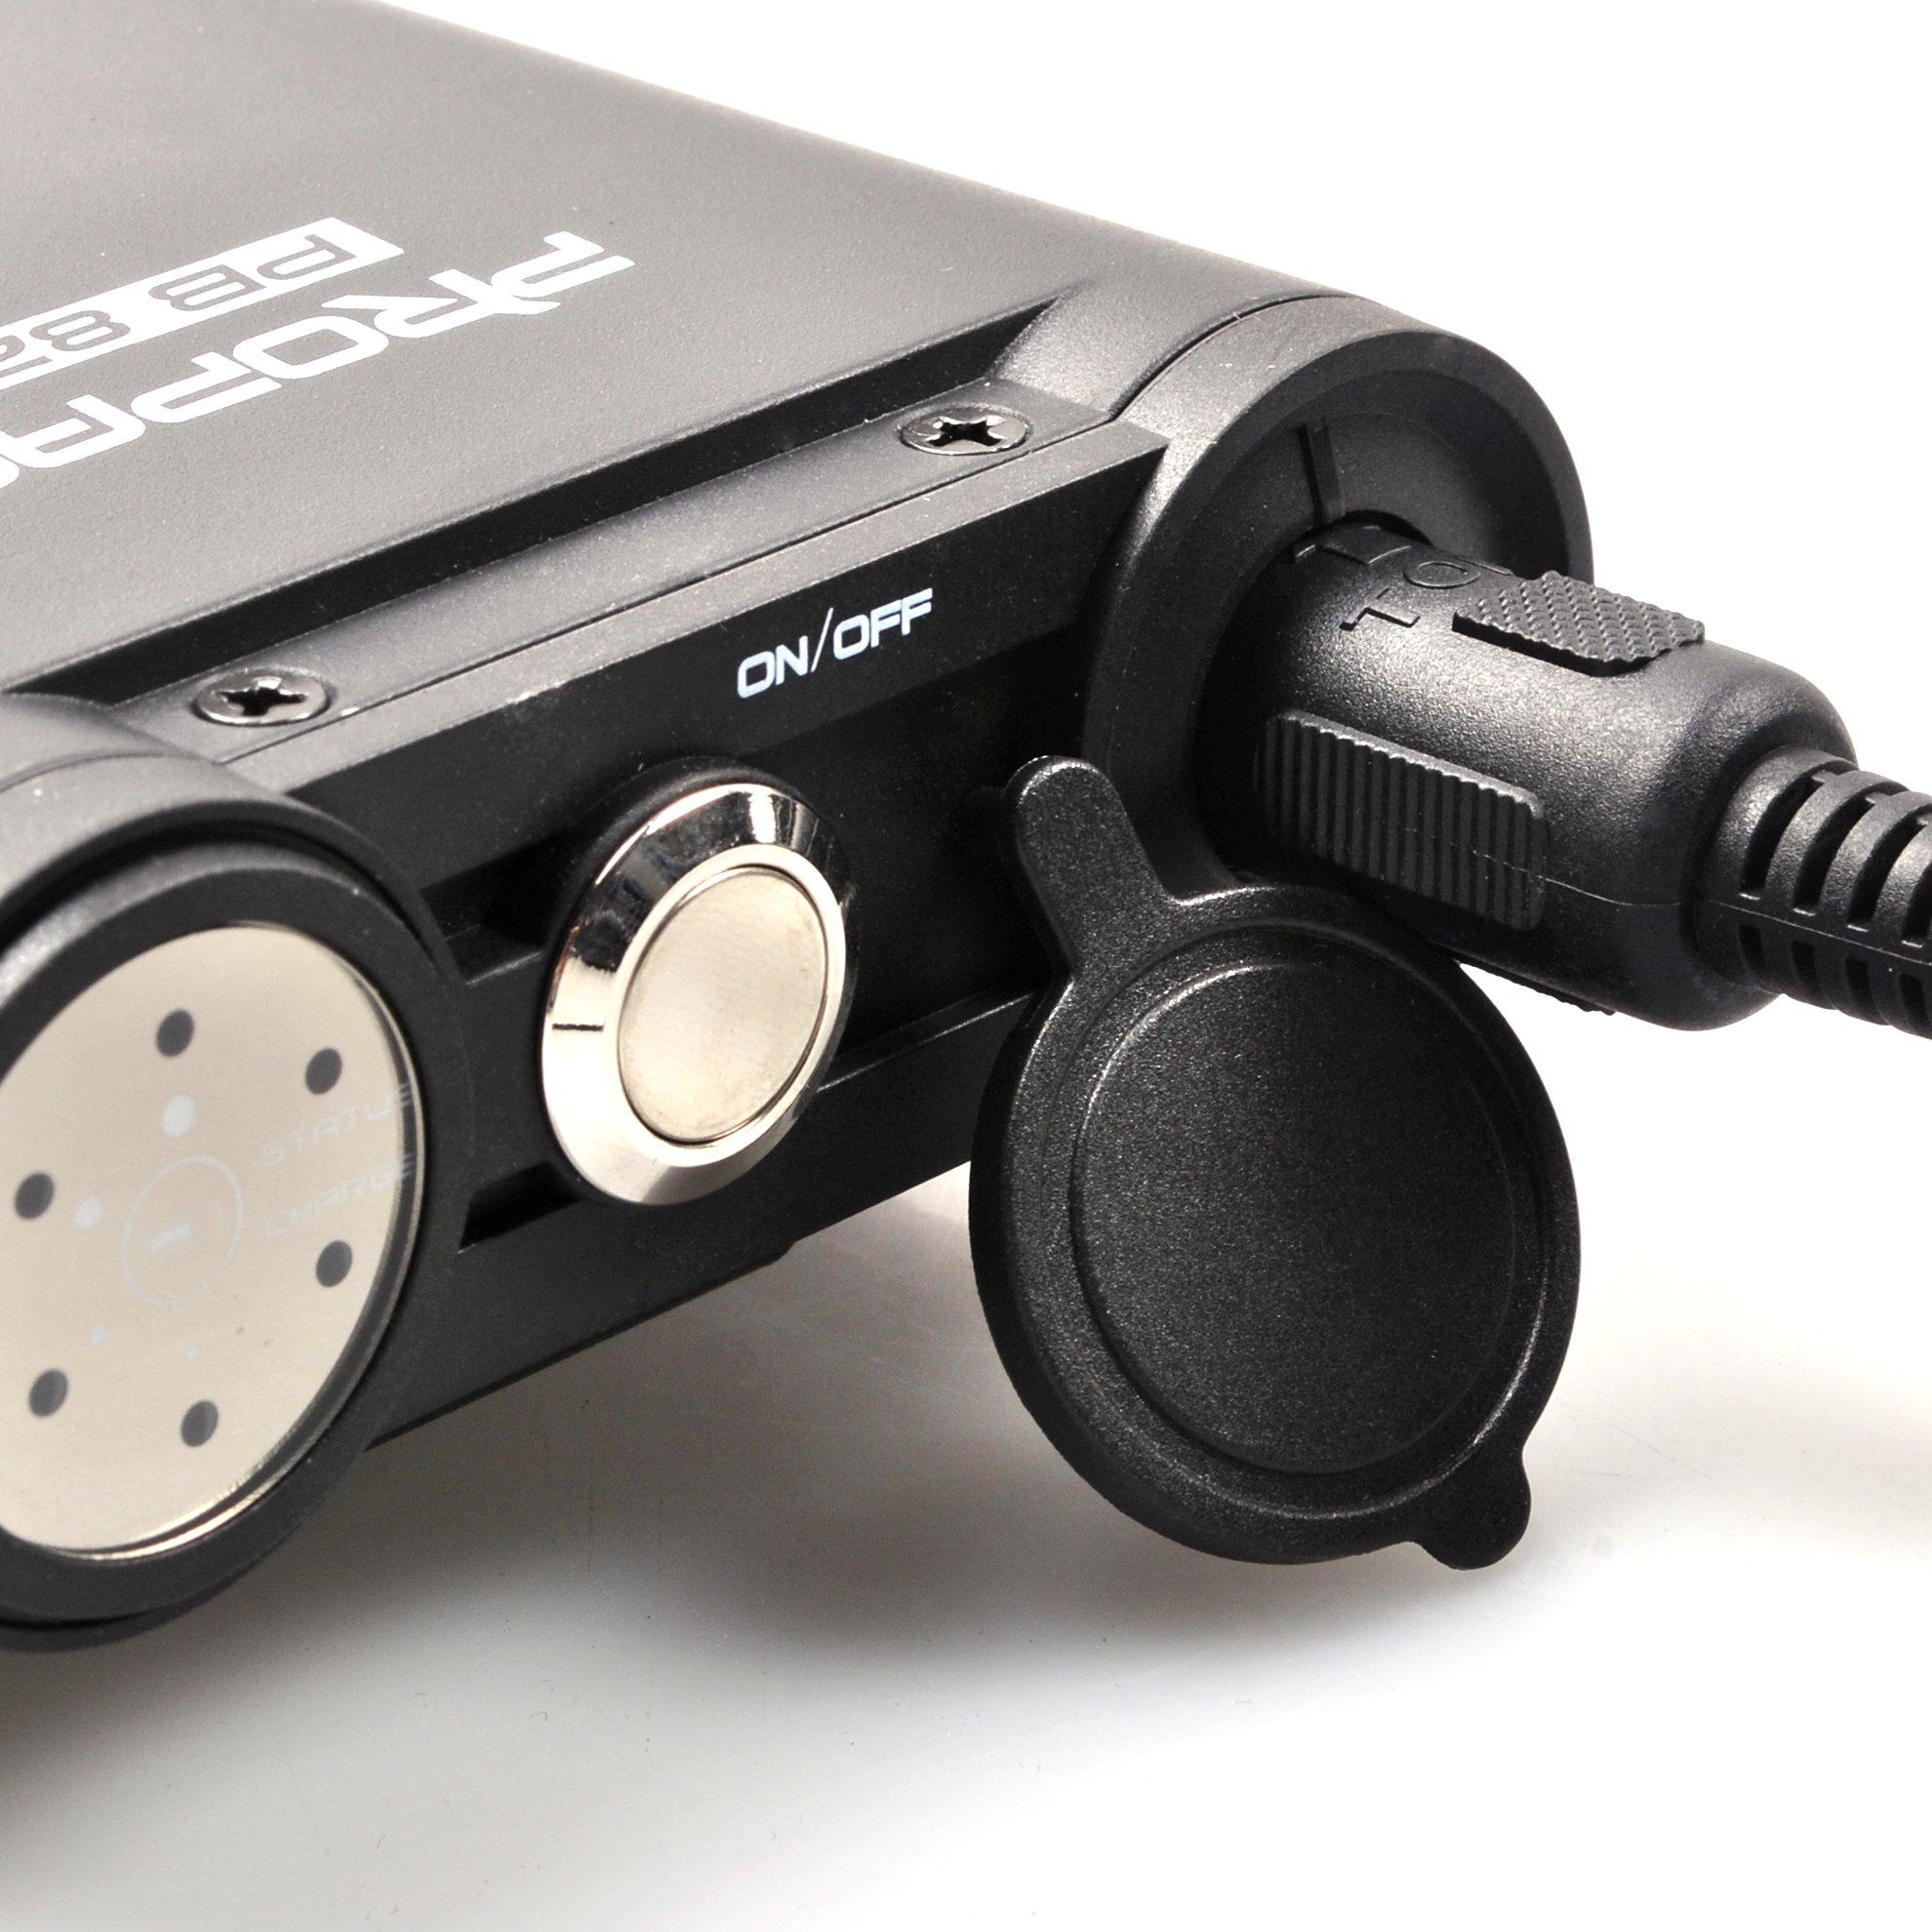 Godox Portable Extended Flash Power Battery Pack for Canon 580EX2 Nikon SB900 Sony HVL-F58AM Olympus FL-50R by Godox